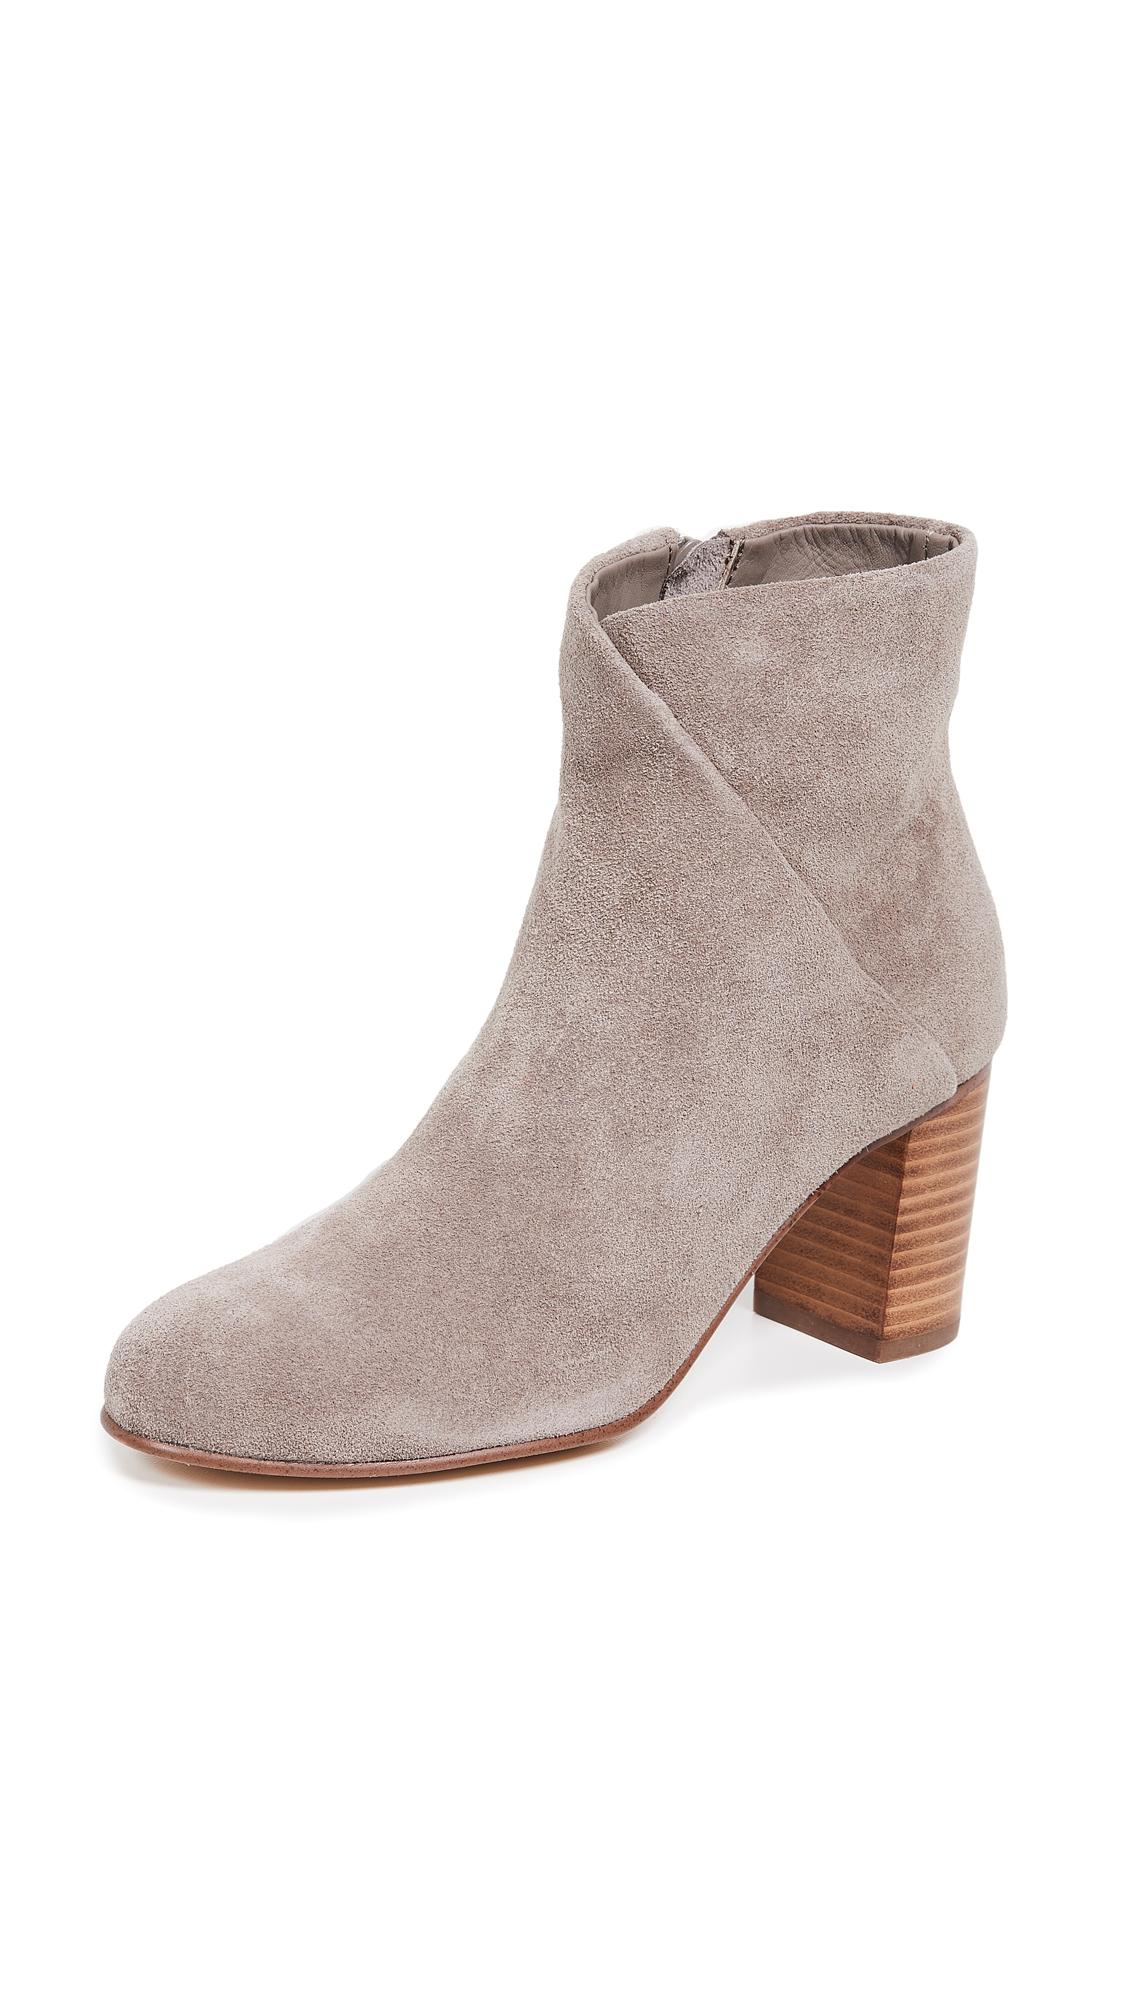 Soludos Mid Heel Venetian Booties - Mineral Grey